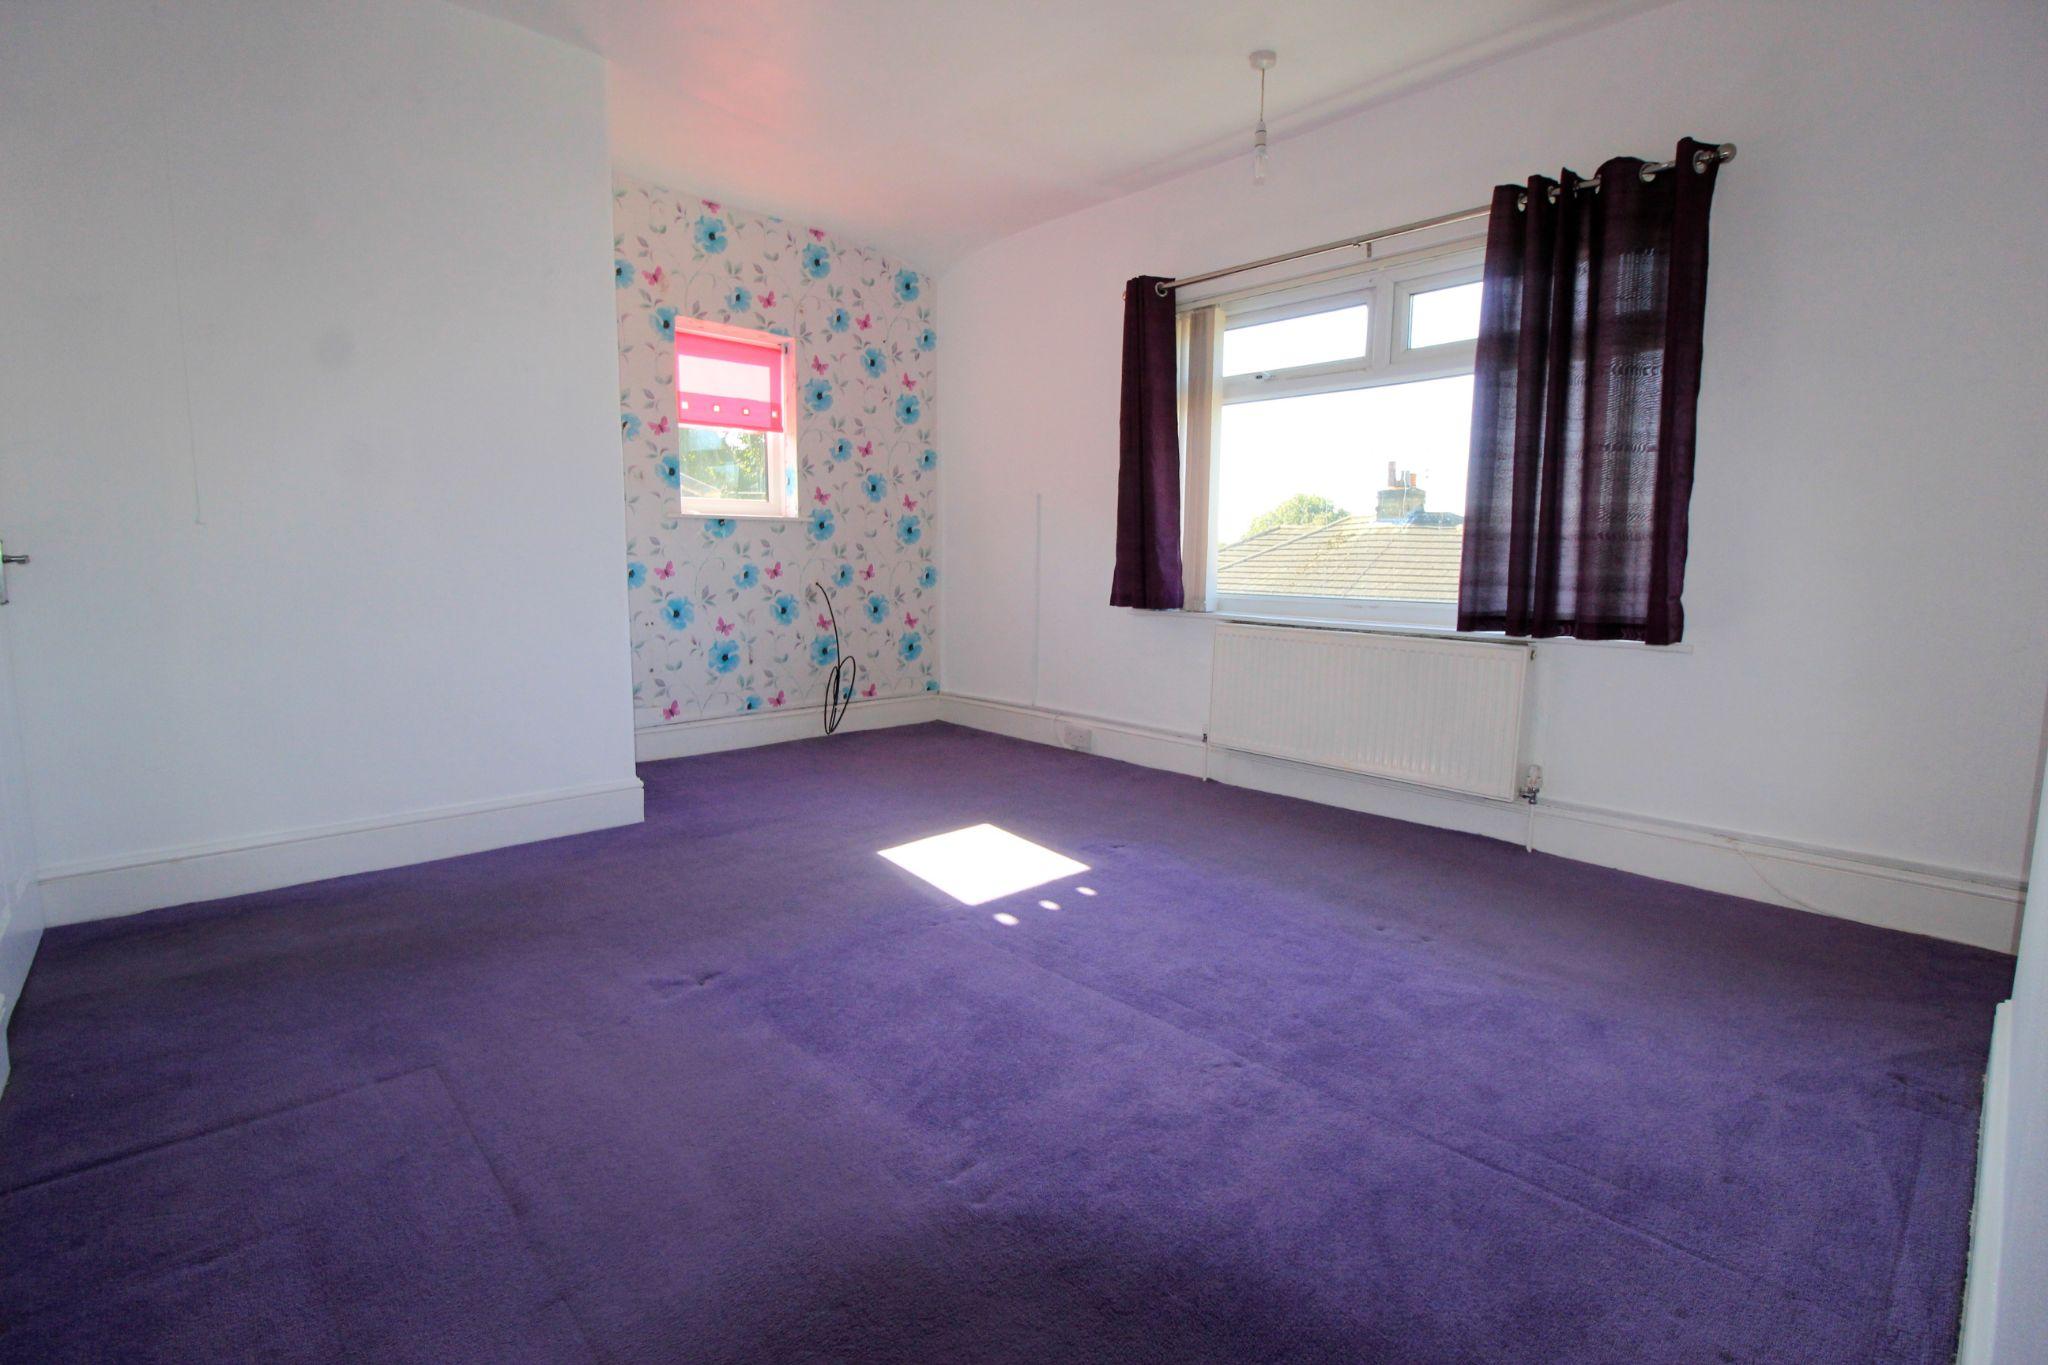 2 bedroom semi-detached house Let in Bradford - Bedroom 1